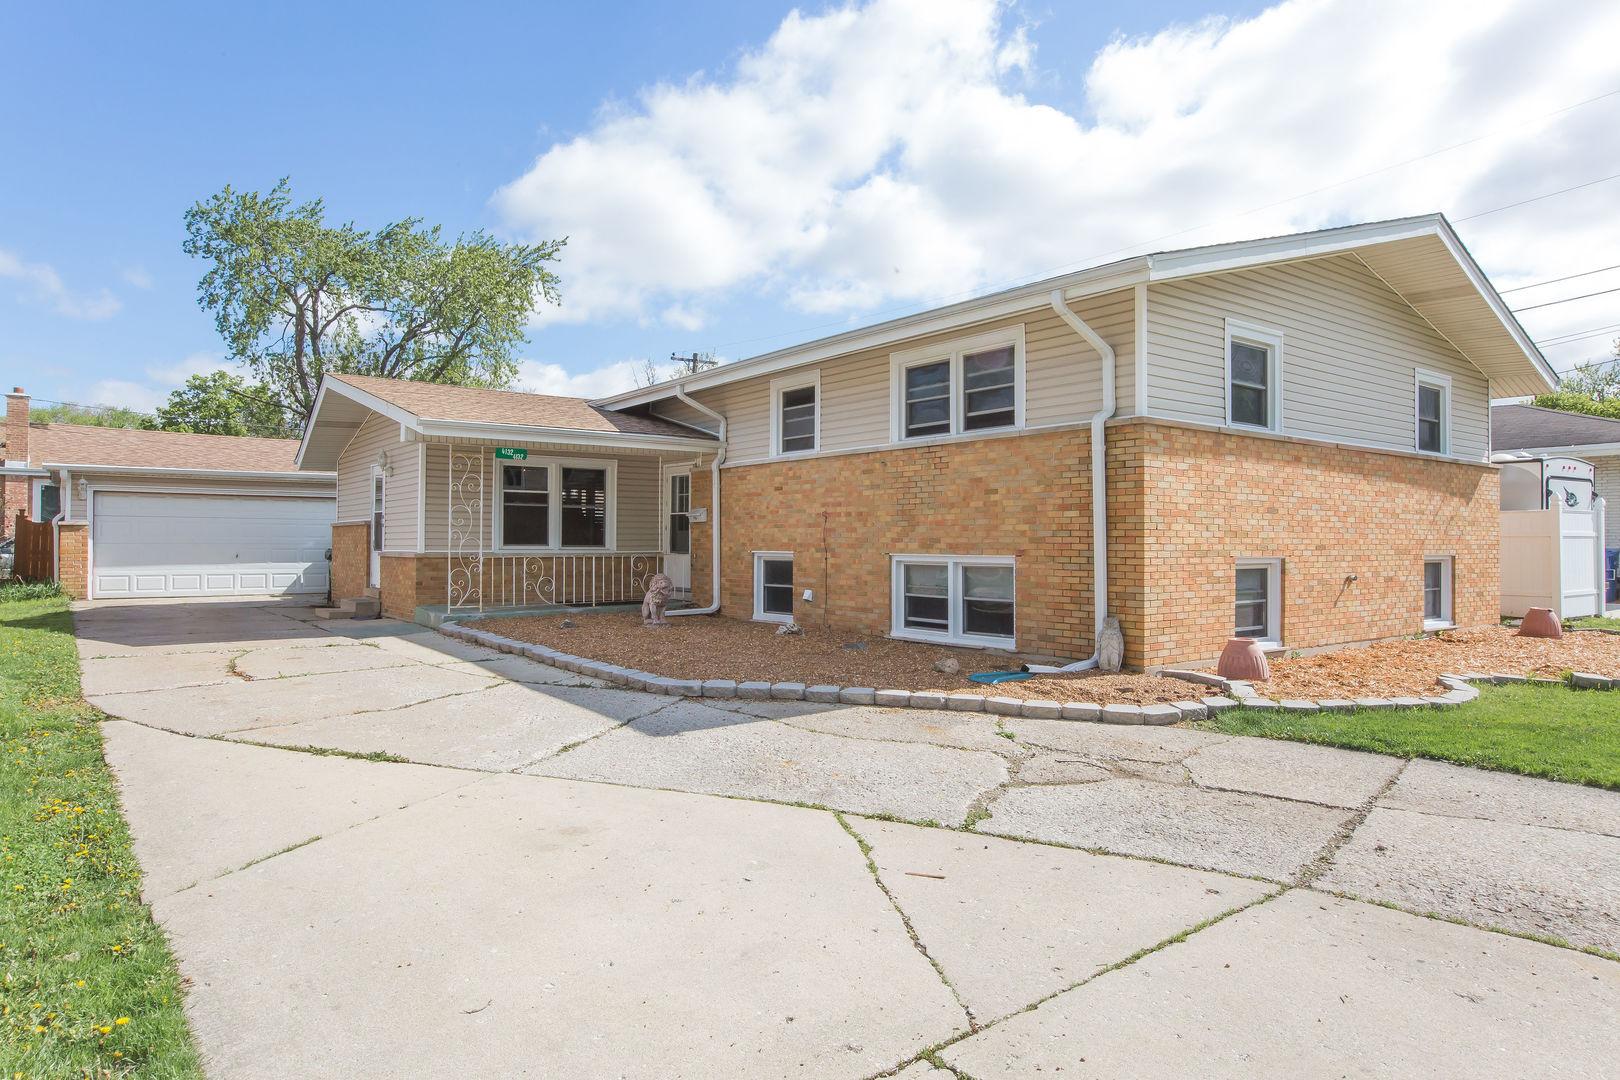 Photo of 4132 101st Oak Lawn IL 60453